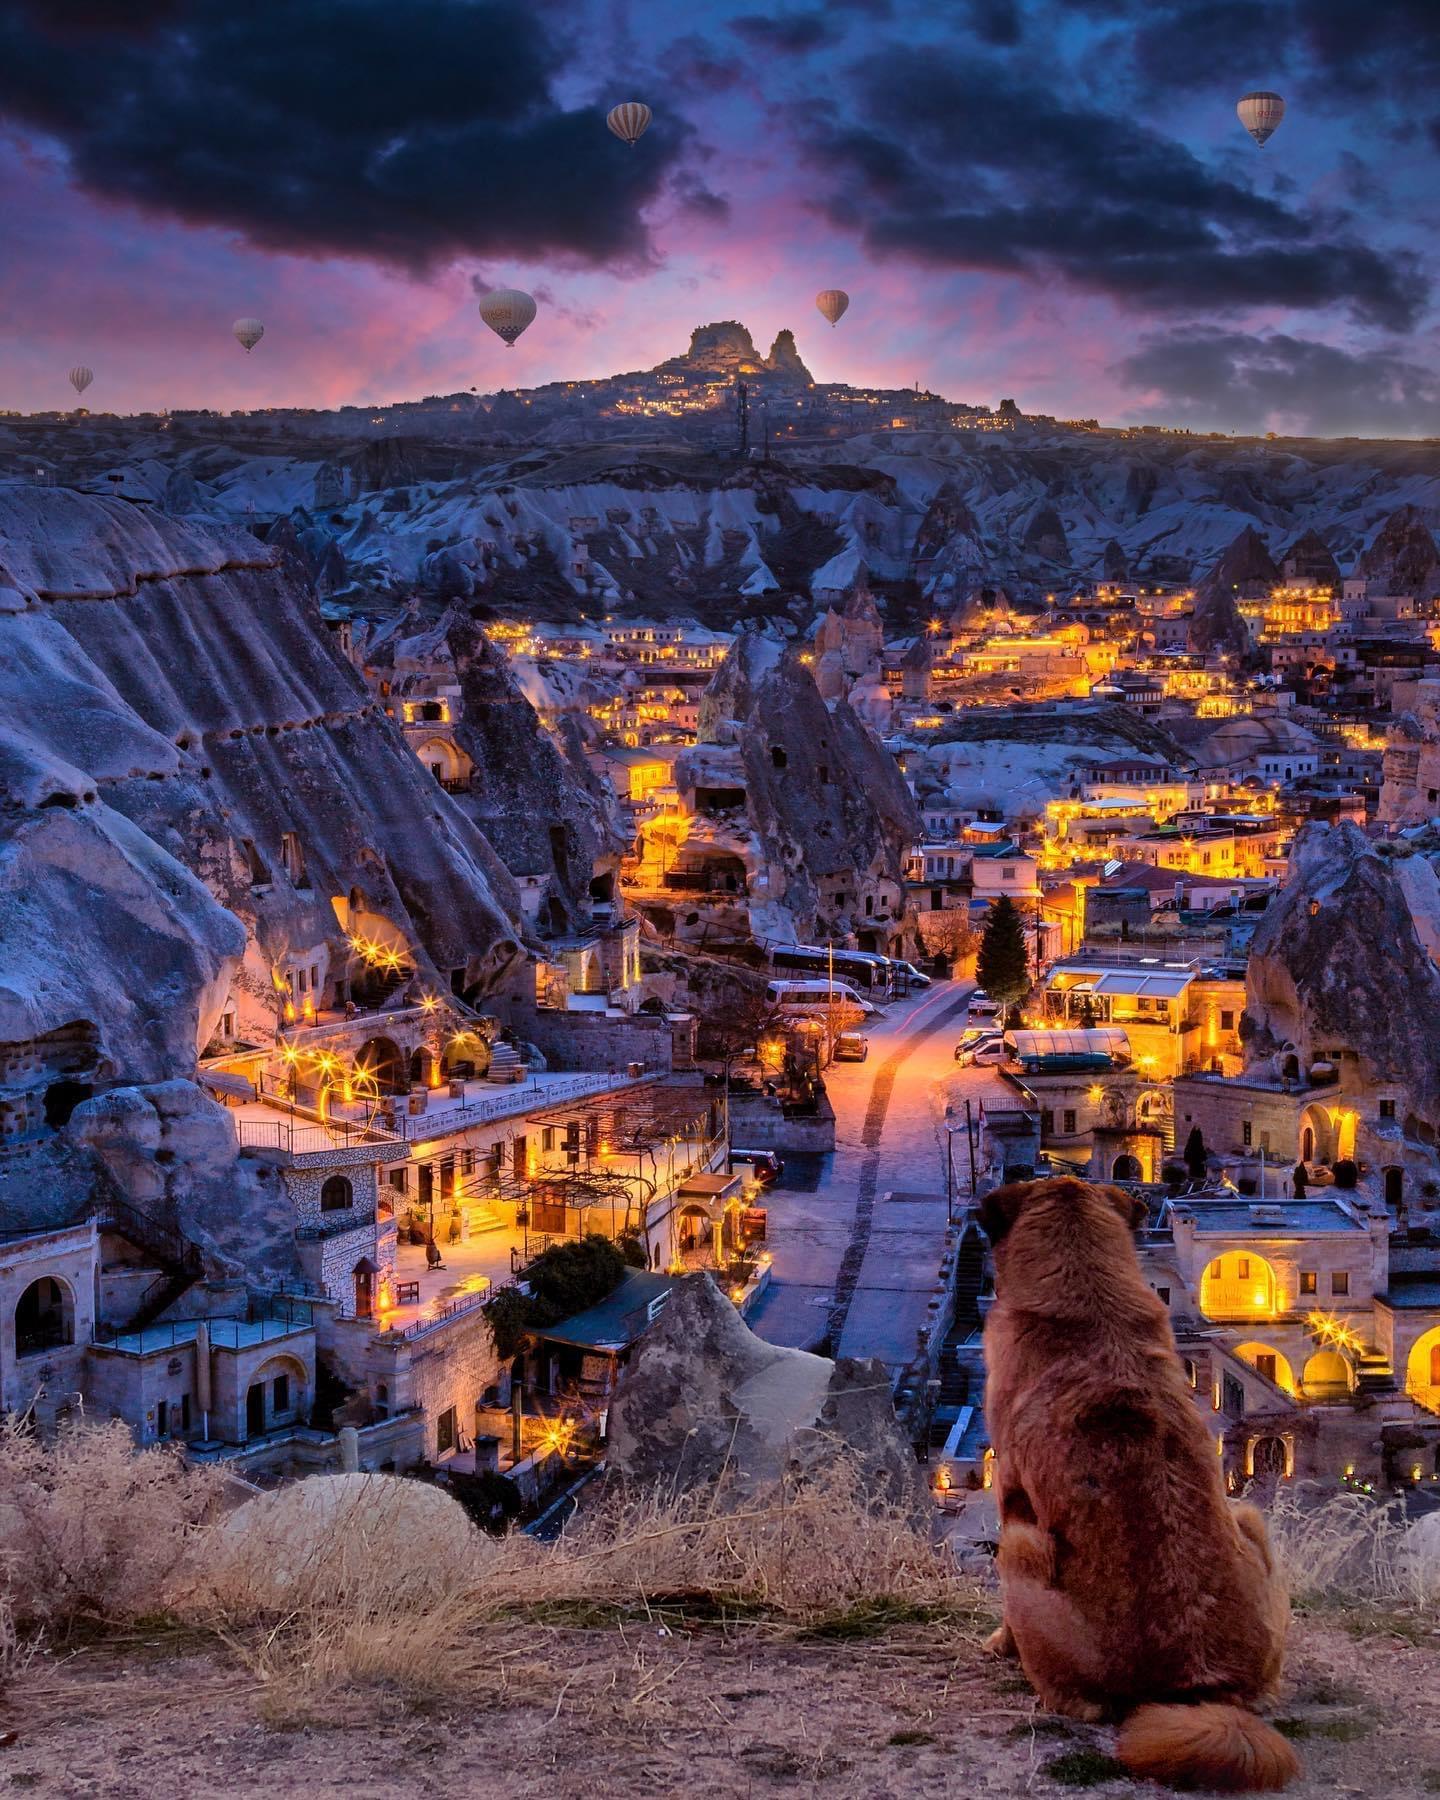 Каппадокия, Турция. Фото Флориан Ольбрехтс